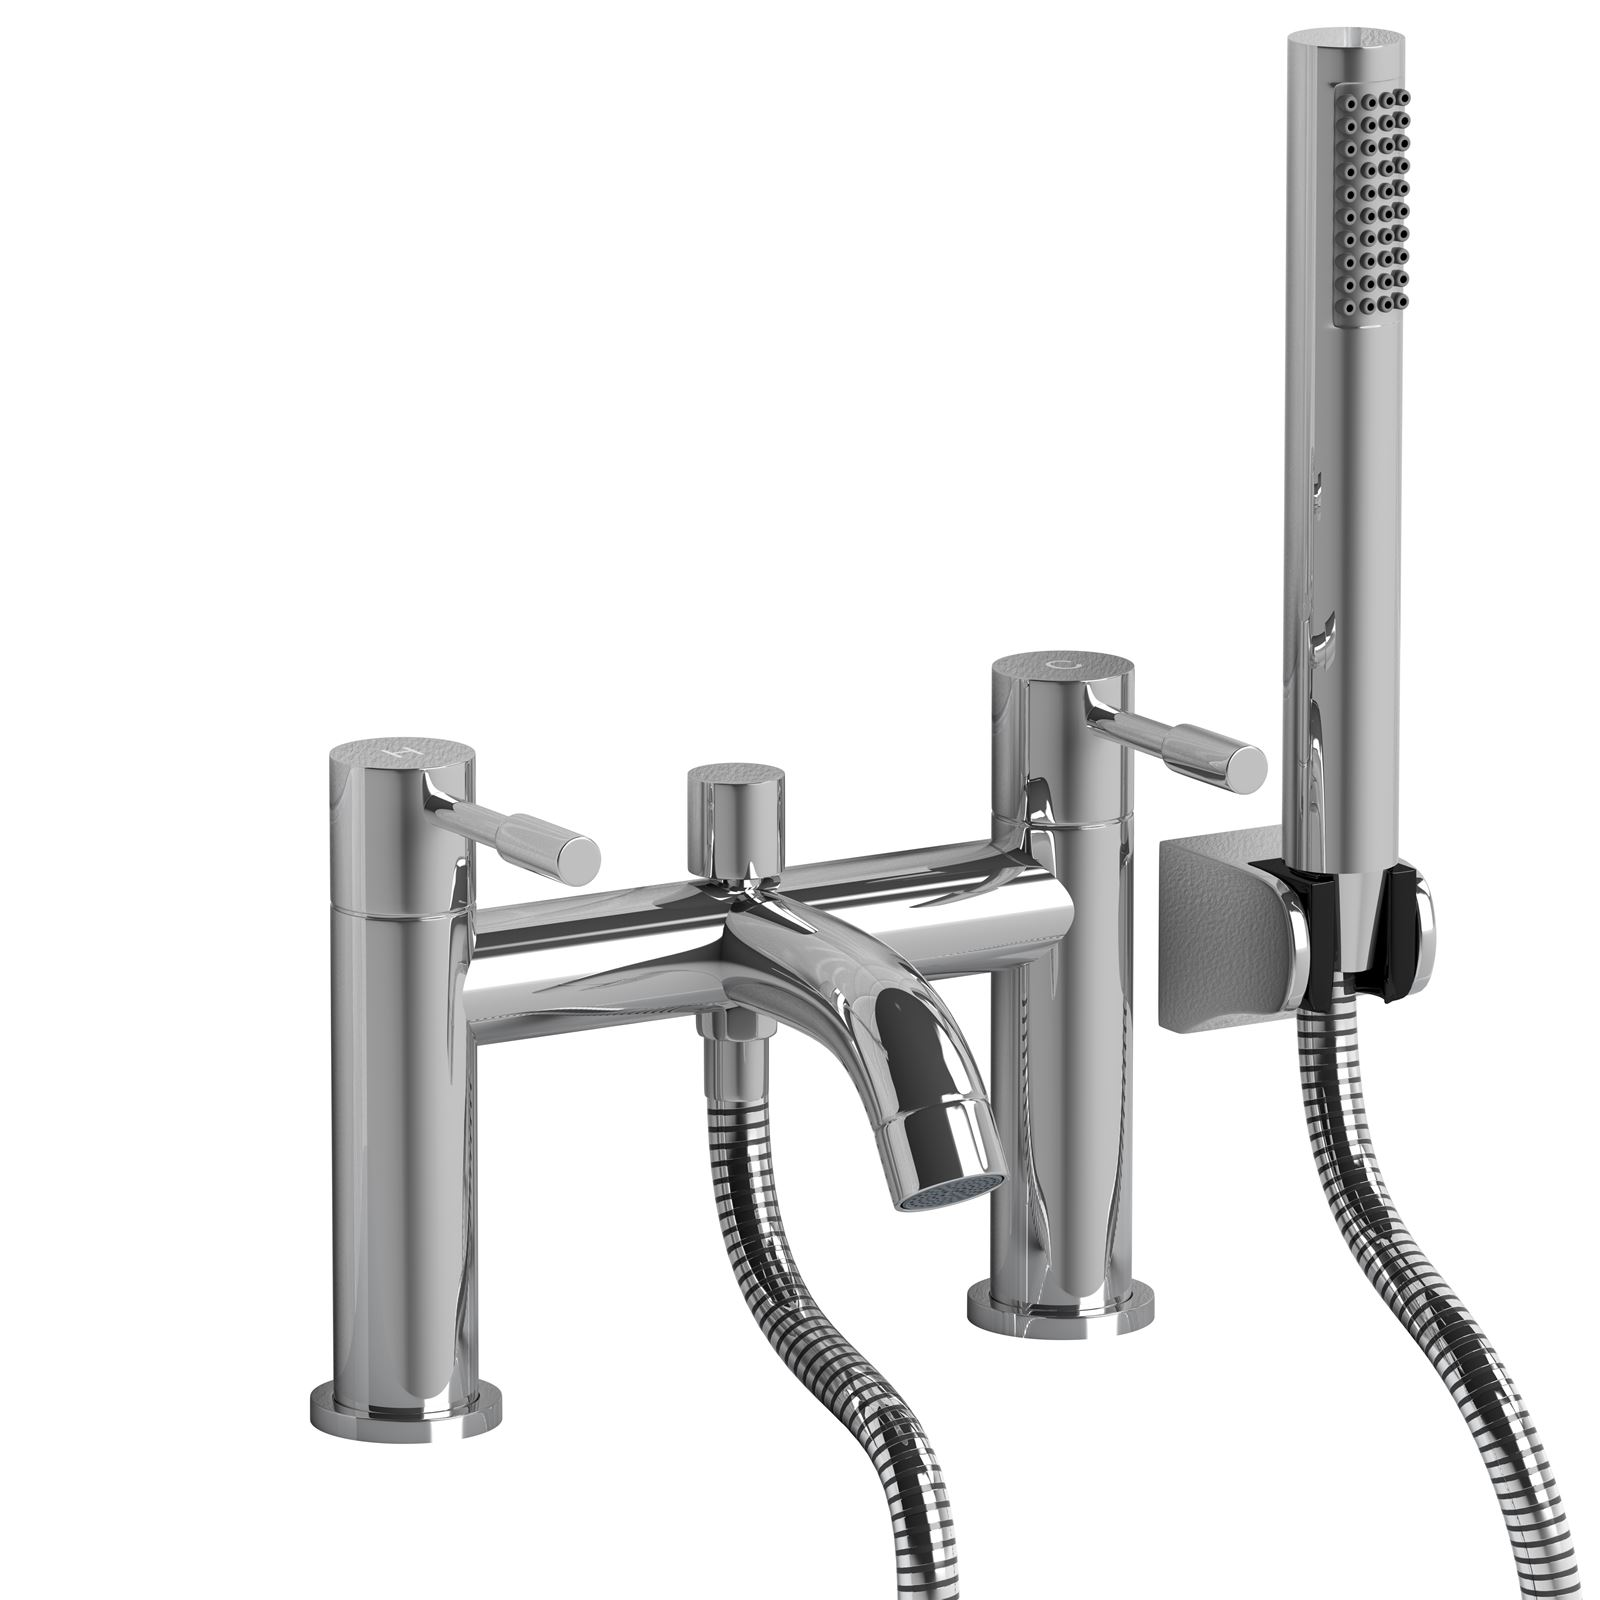 Gx52 Bath Filler Tap Modern Chrome Plated Brass With